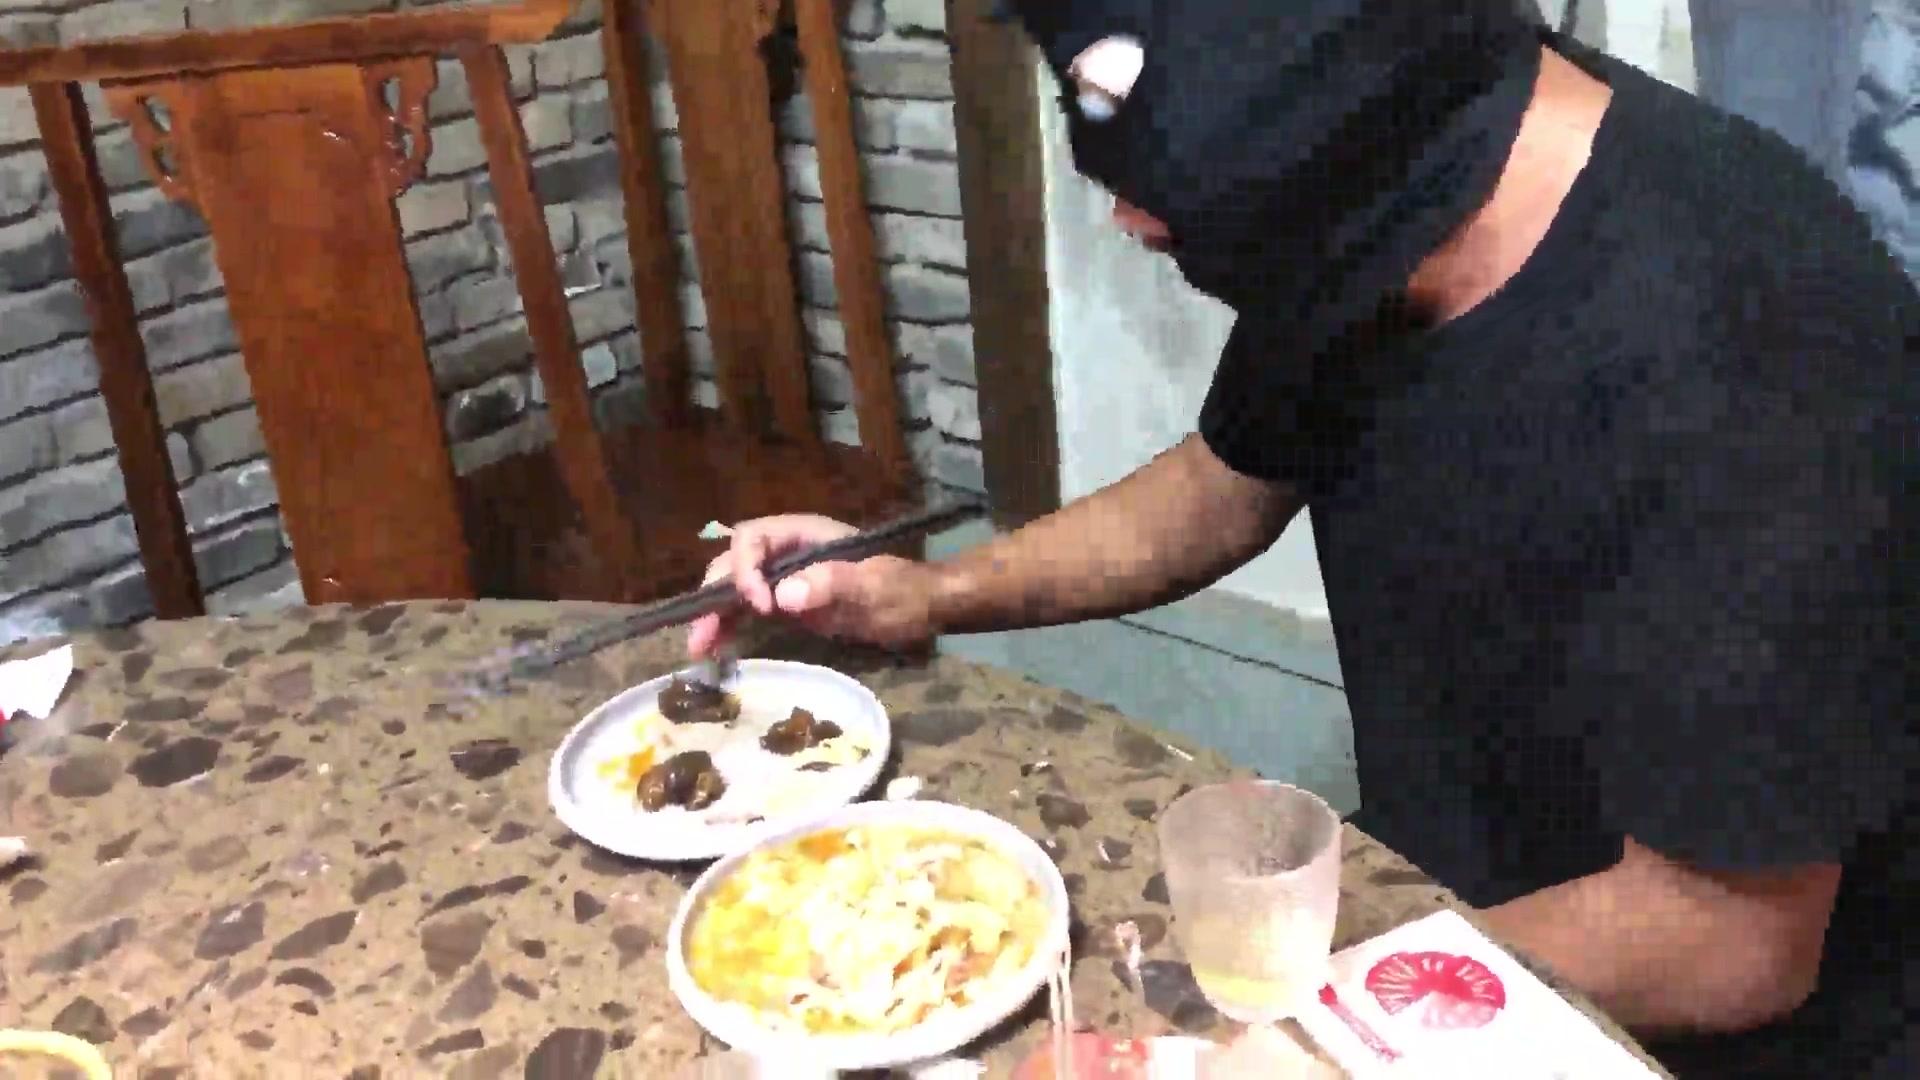 Outdoor hot pot restaurant, golden holy water, saliva, vomit, language humiliation, verbal abuse